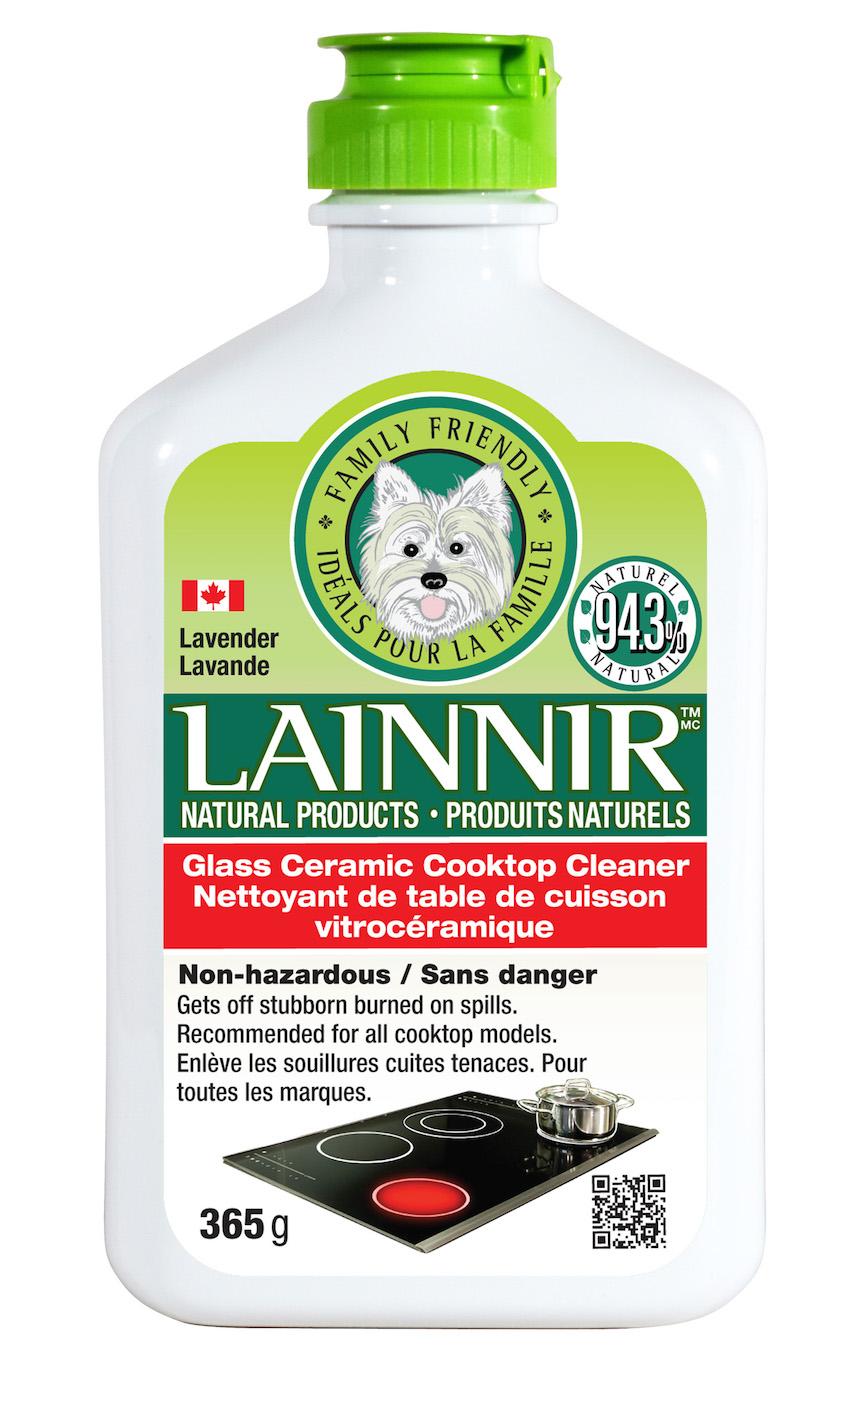 Lainnir-Cooktop-side1-04-14